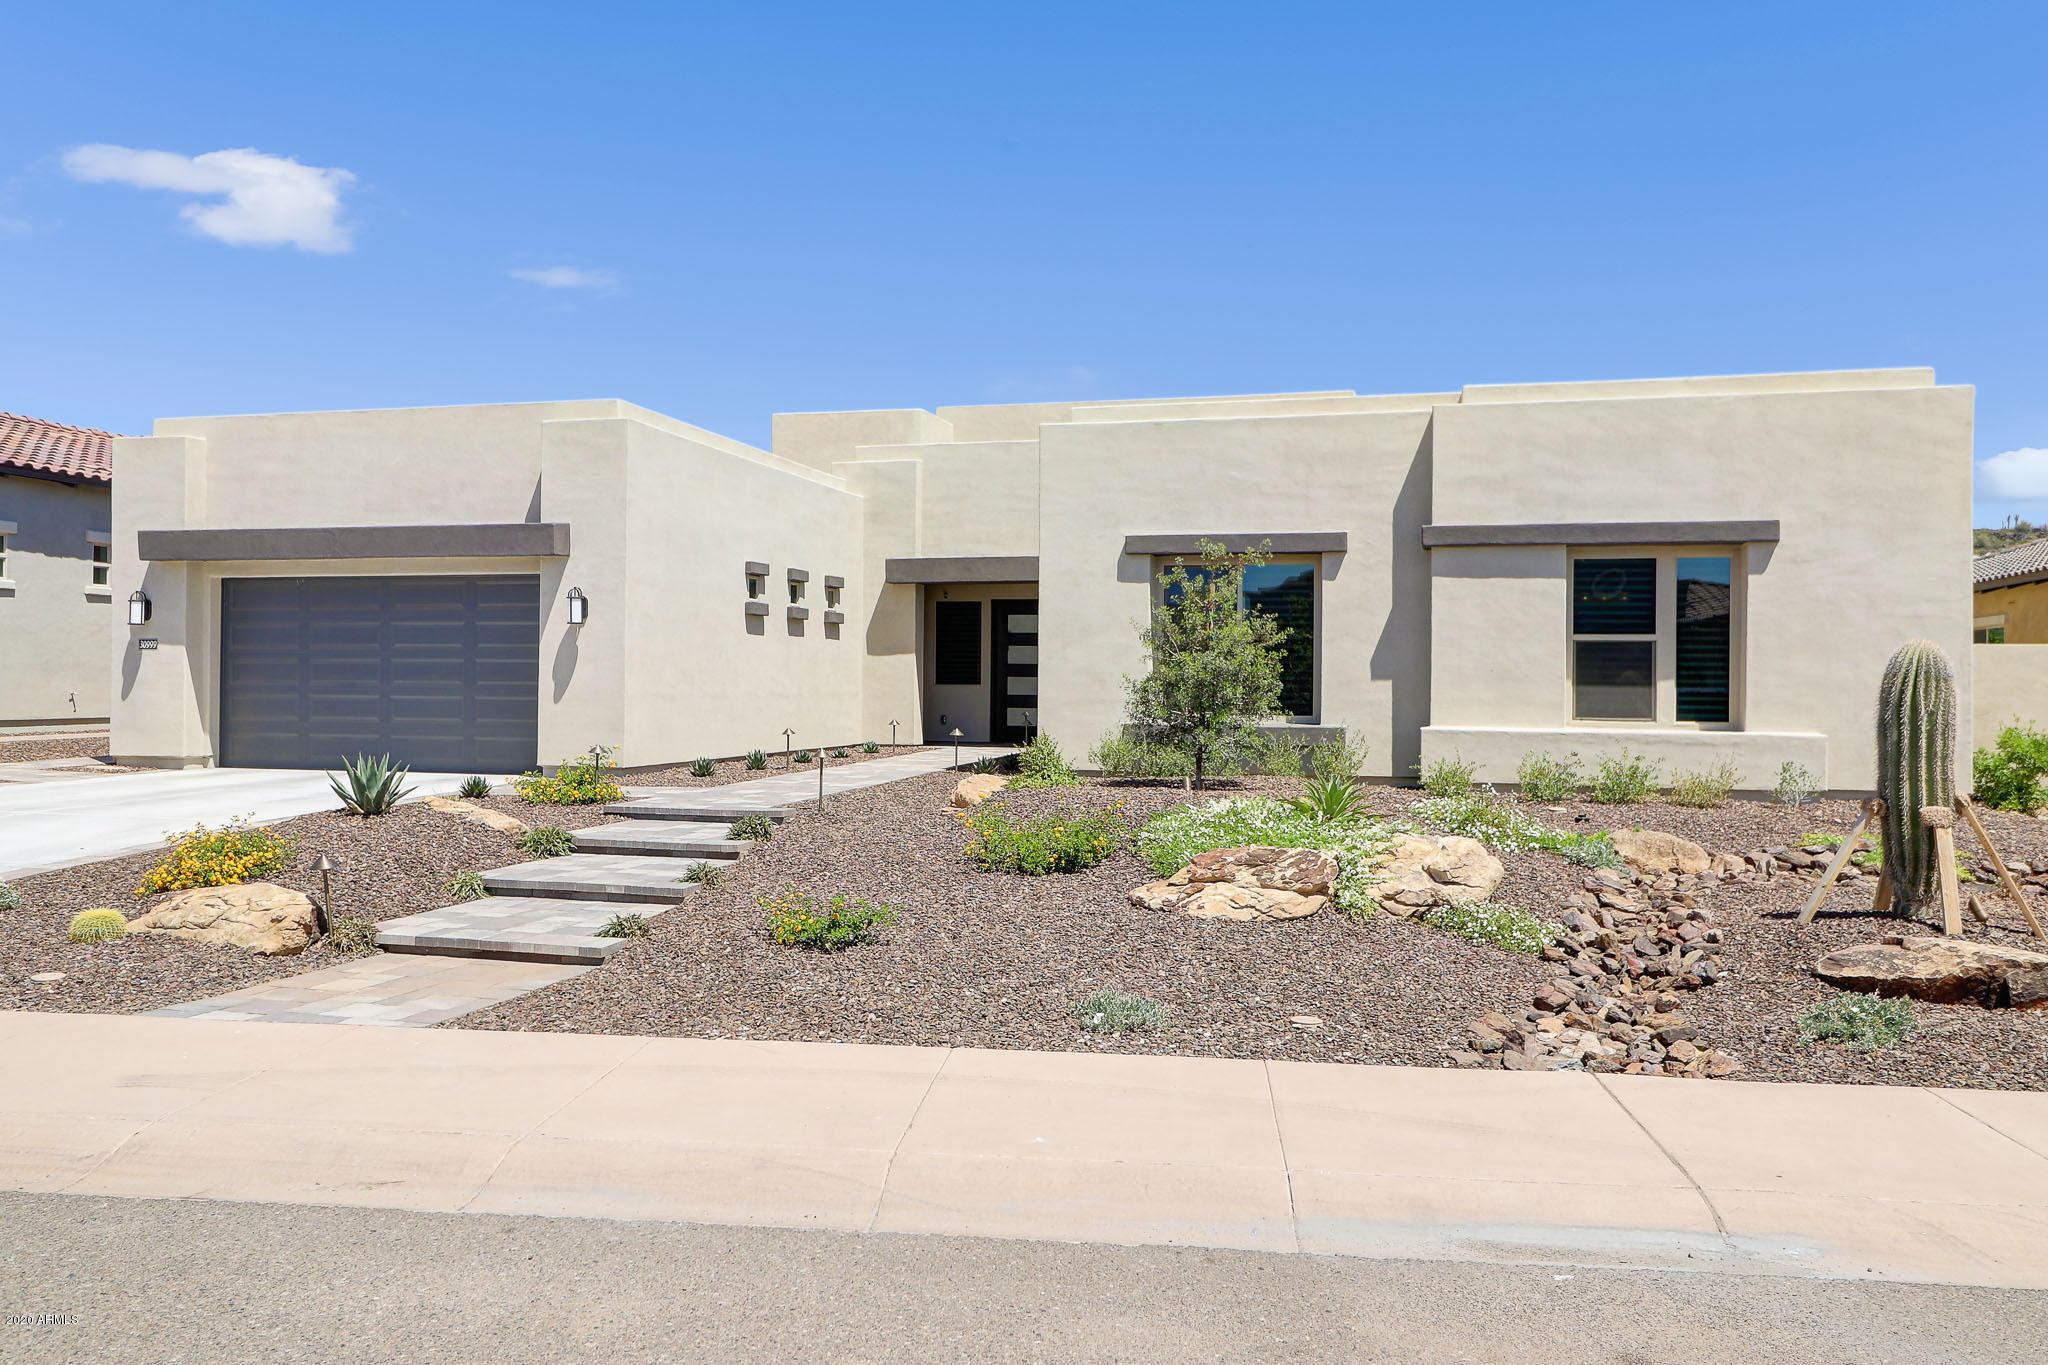 MLS 6071067 Peoria Metro Area, Peoria, AZ 85383 Peoria Homes for Rent